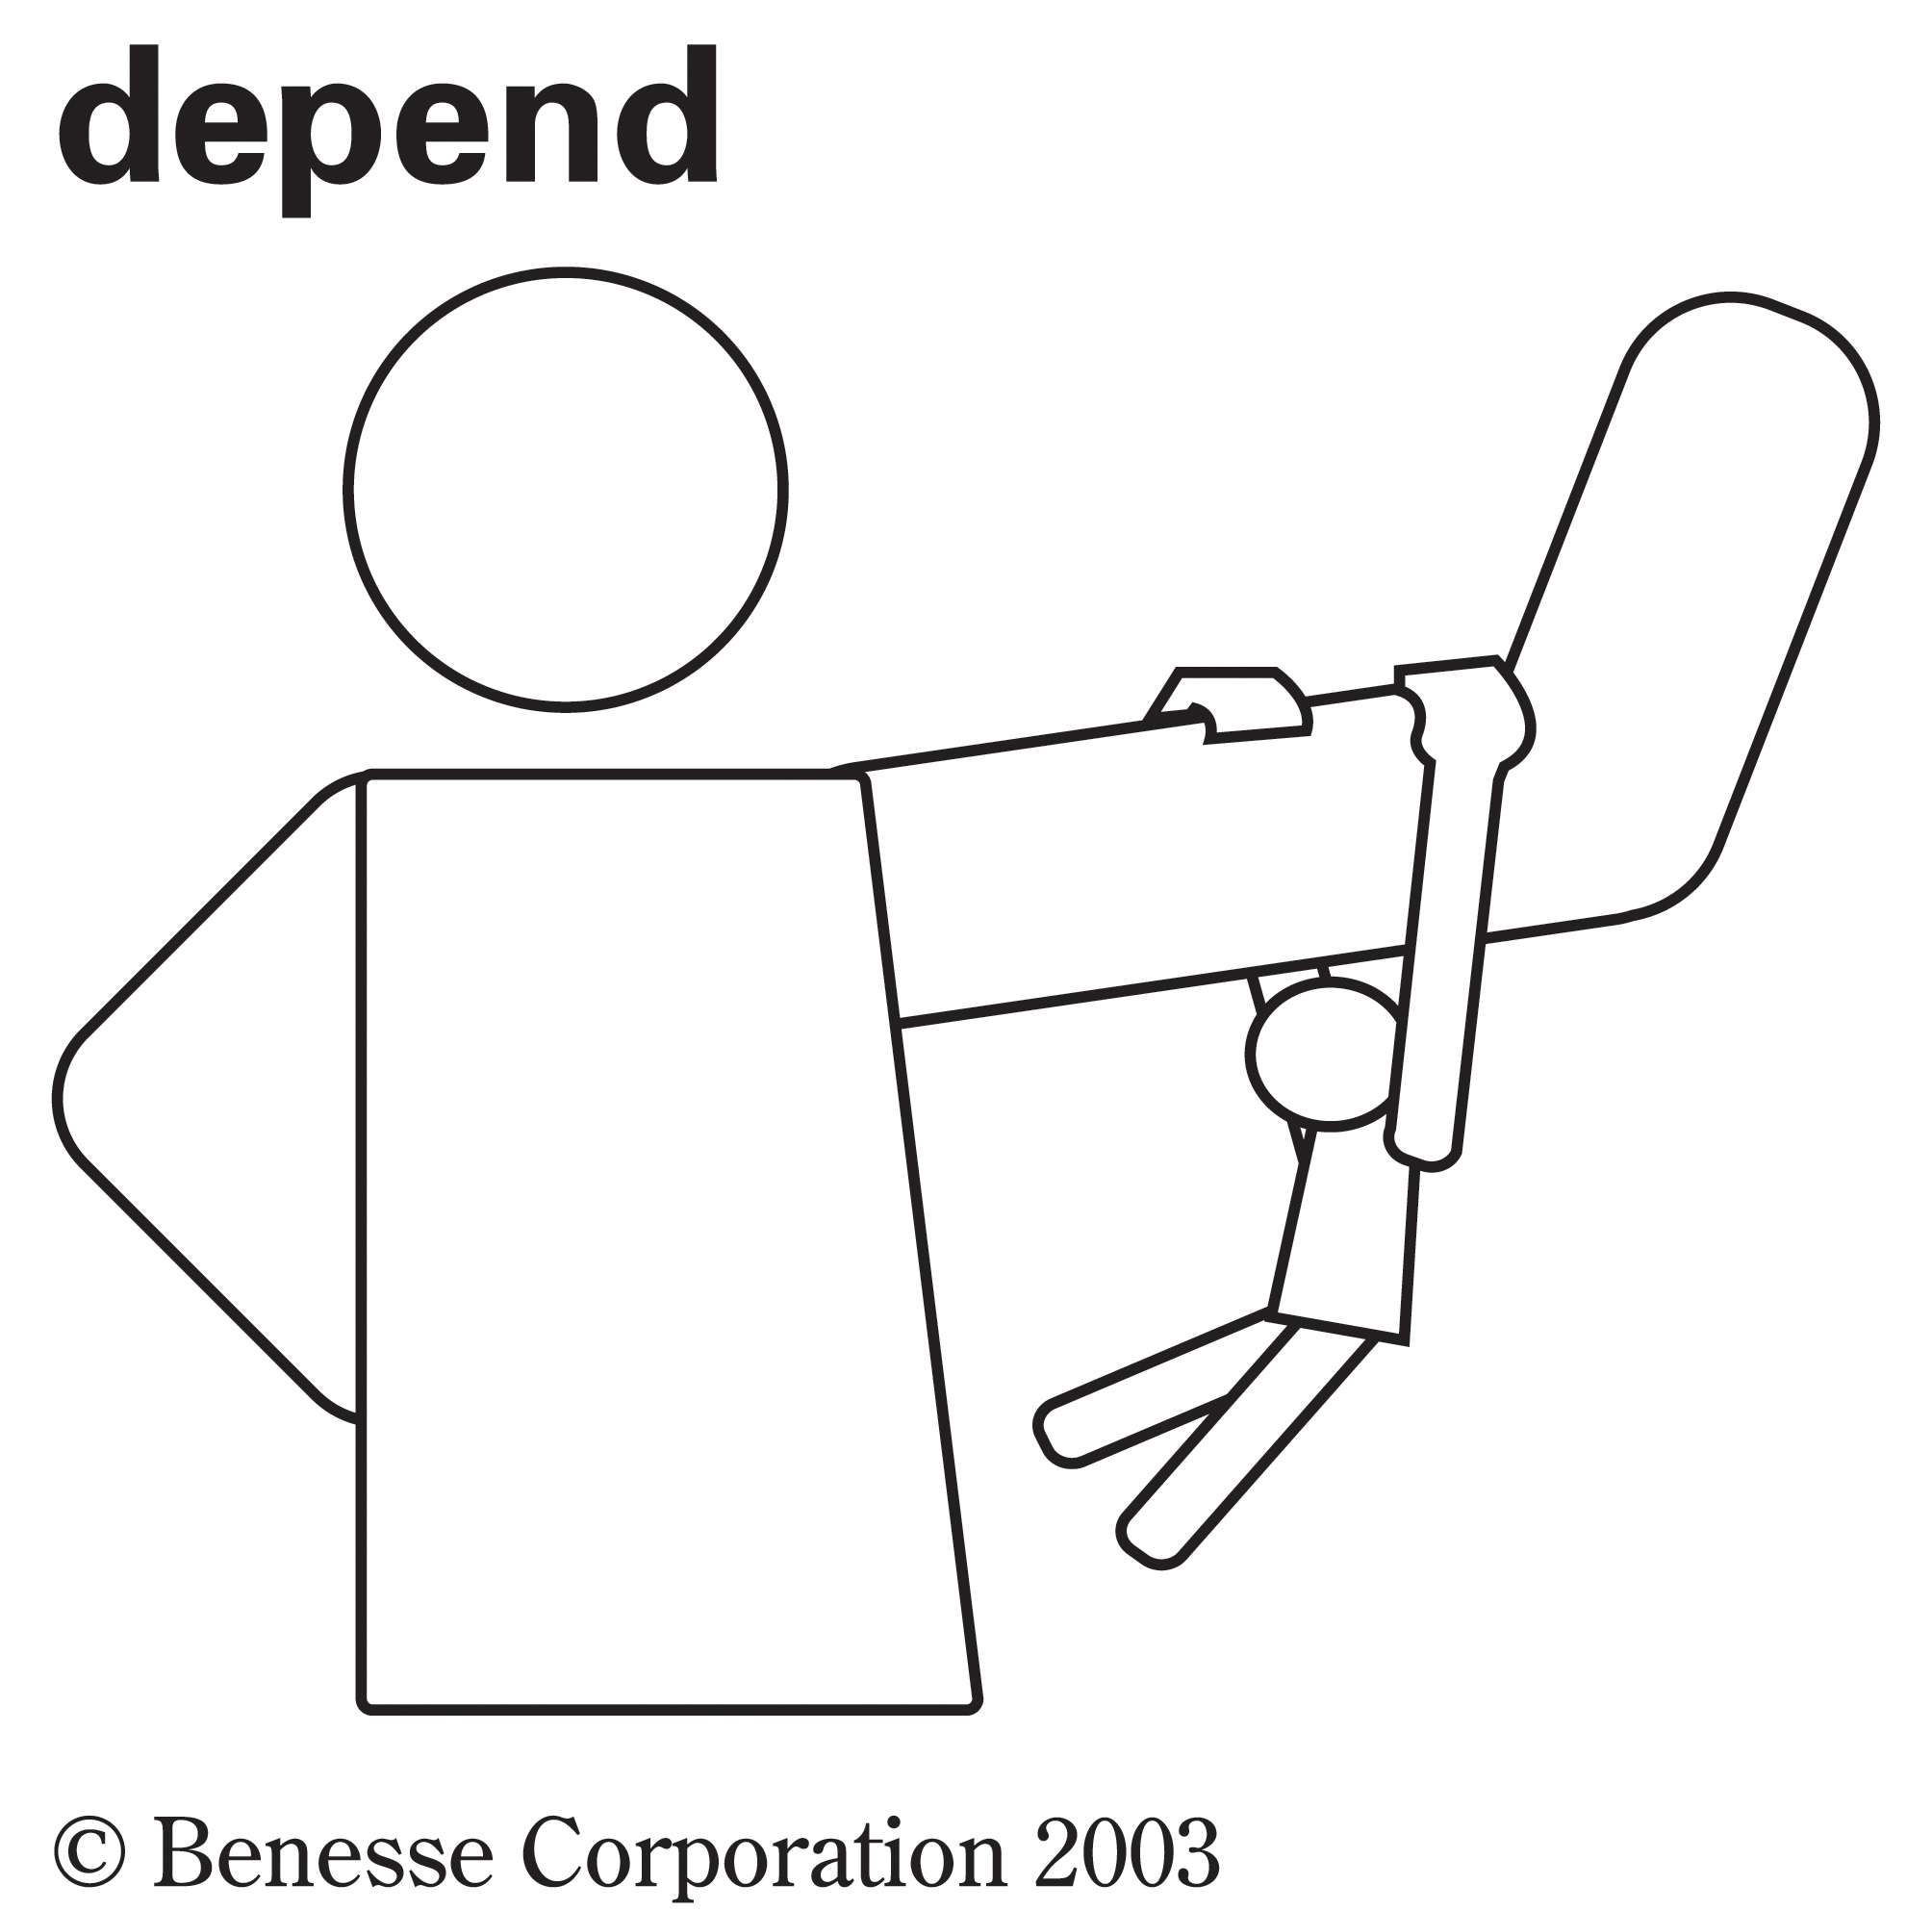 depend01.jpg